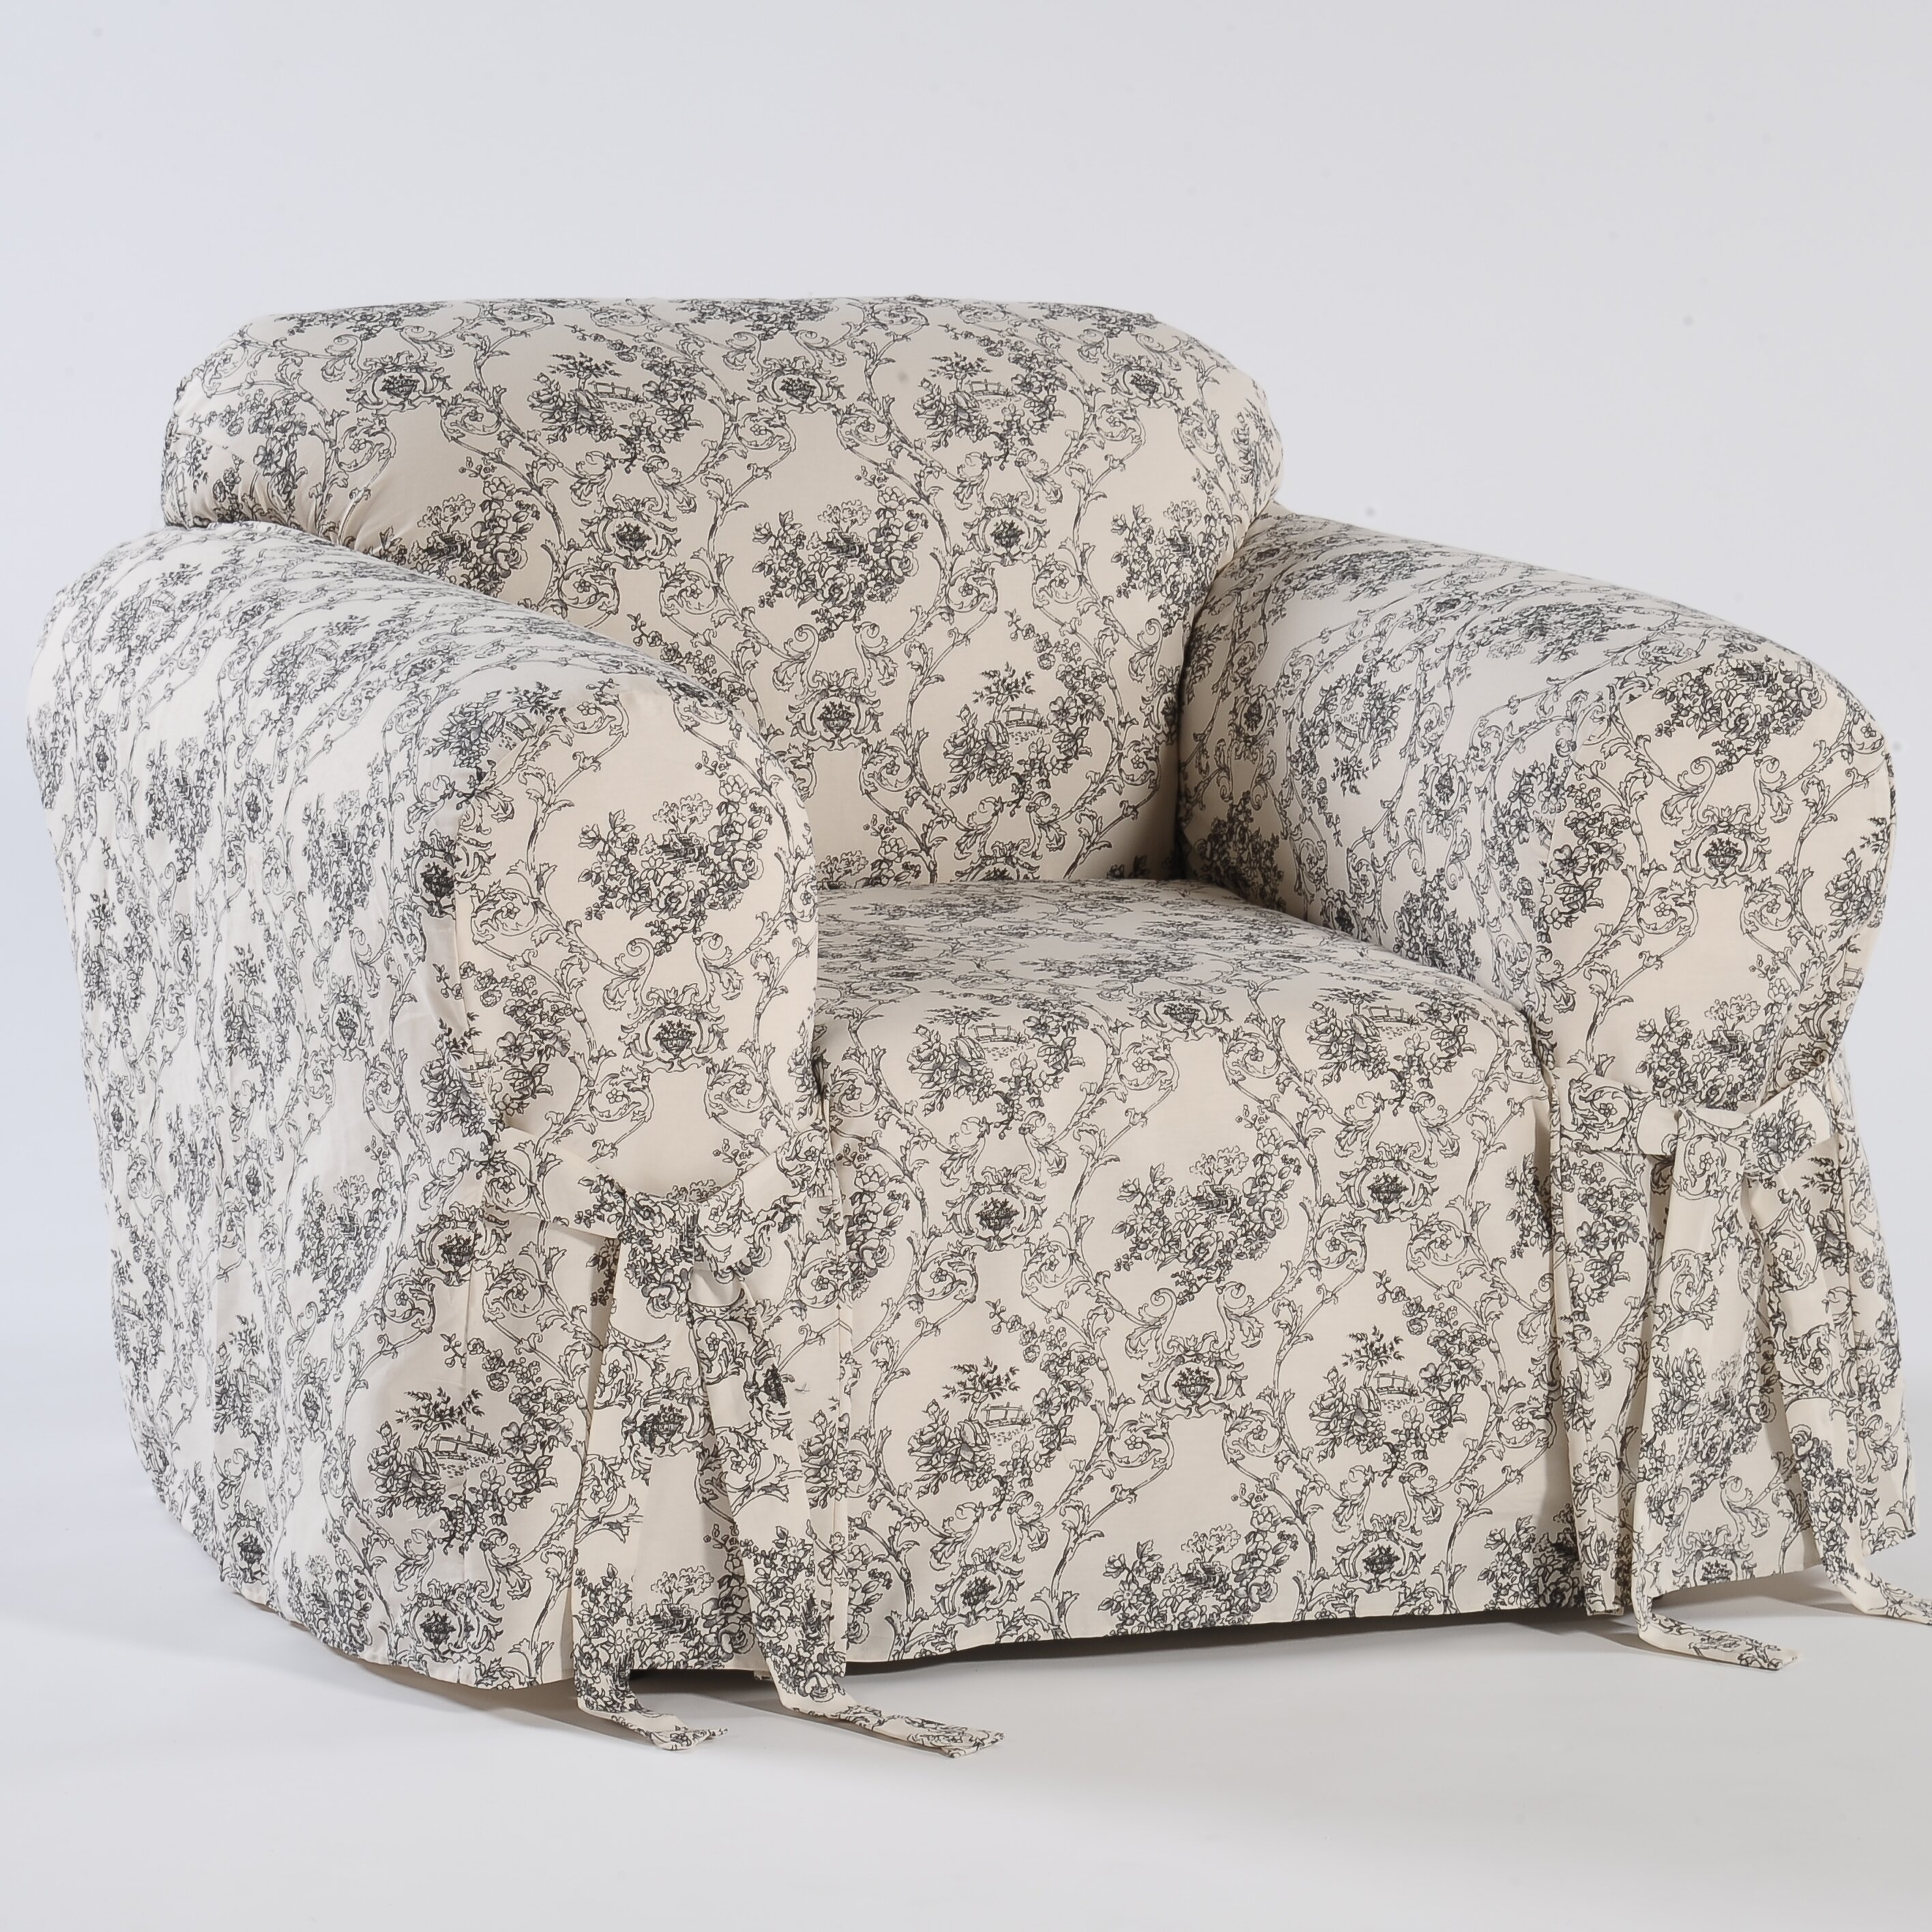 Waverly Sofa Slipcovers hmmi